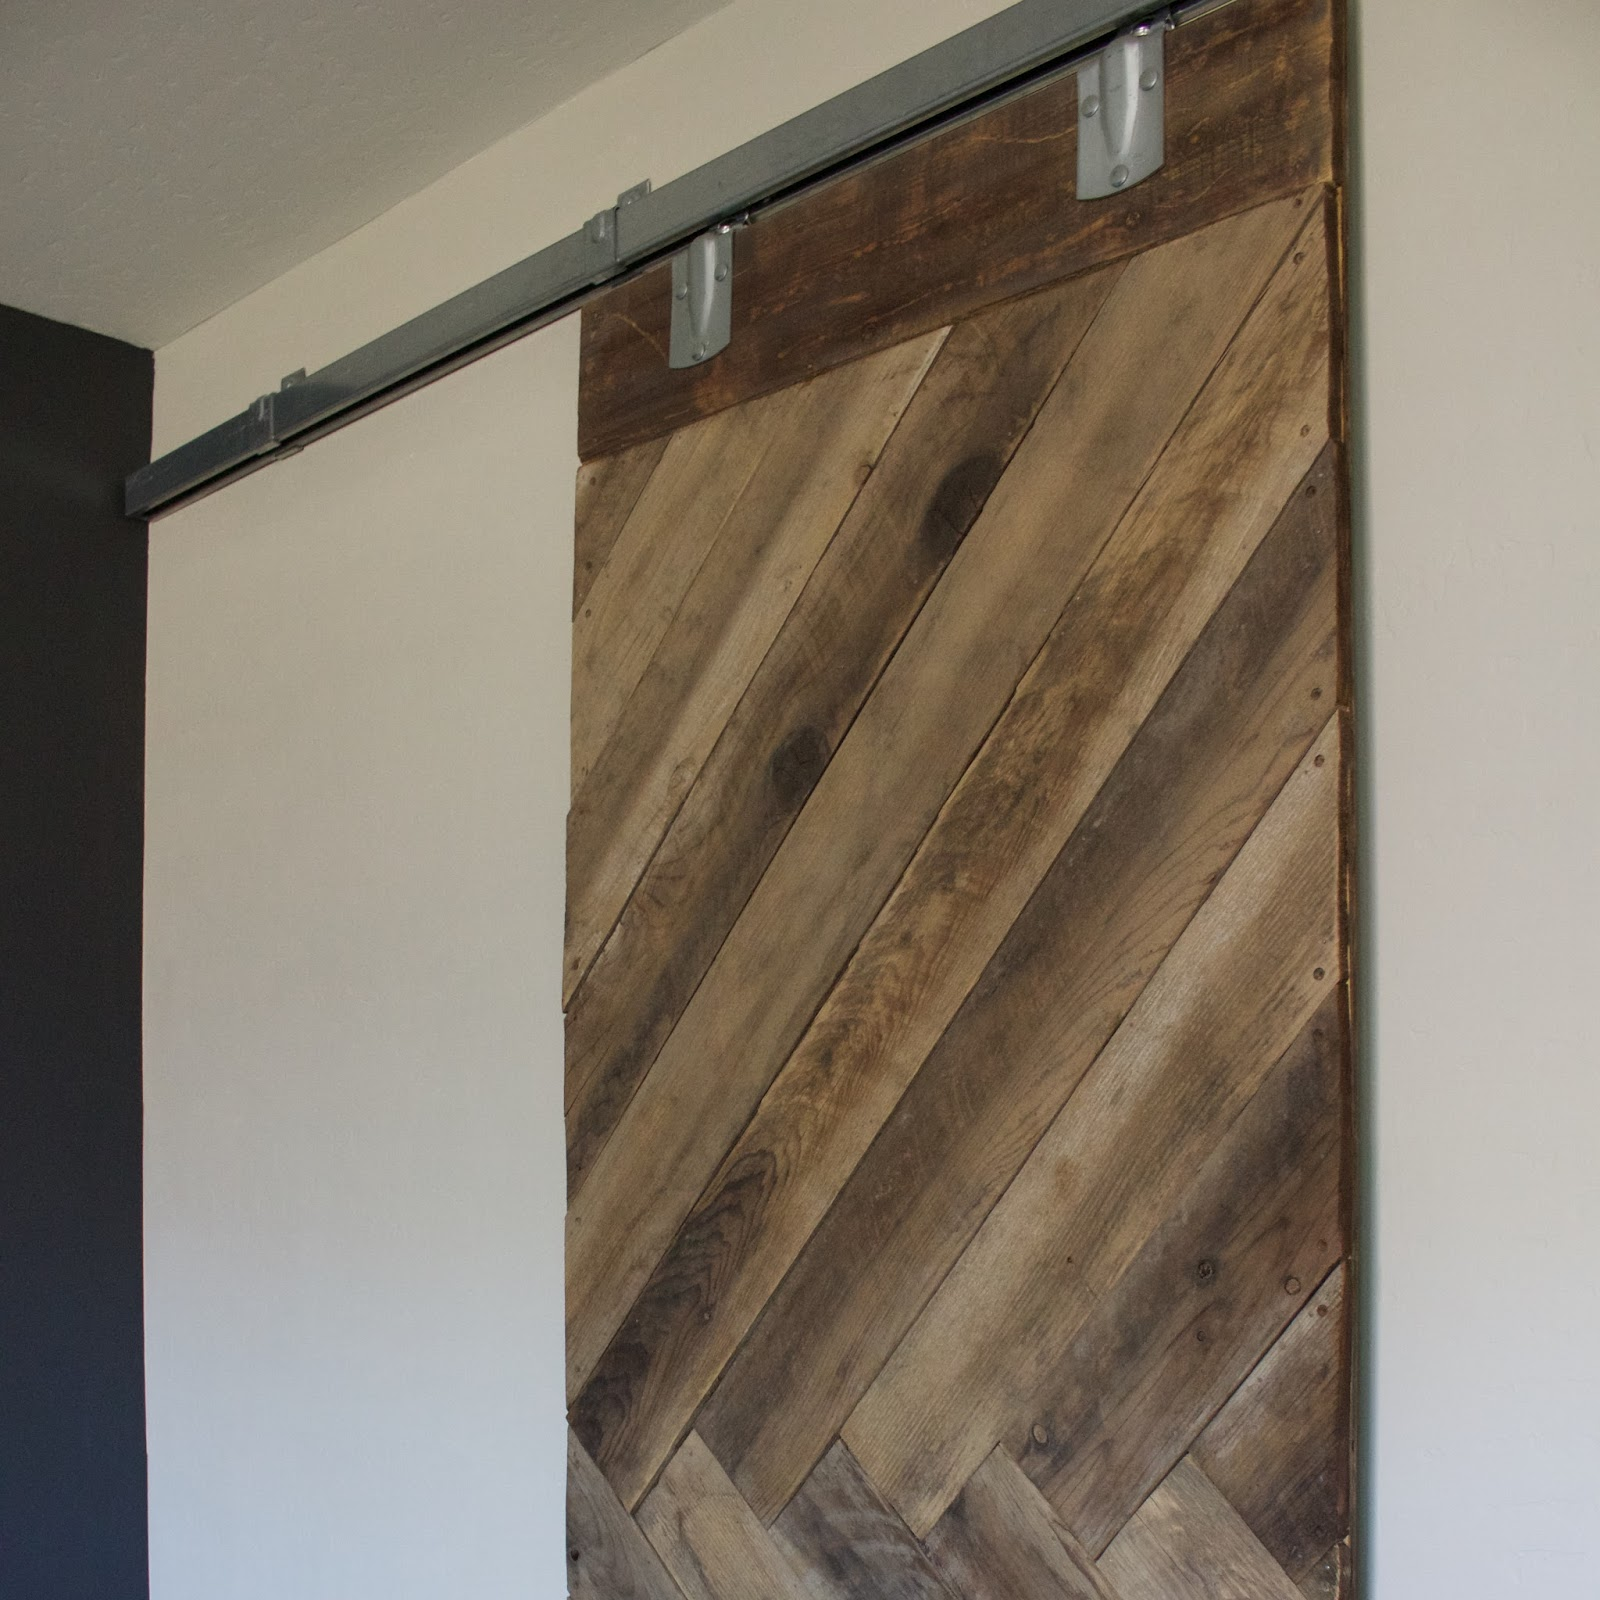 Diy Barn Door For Less Than 100 Hello Allison